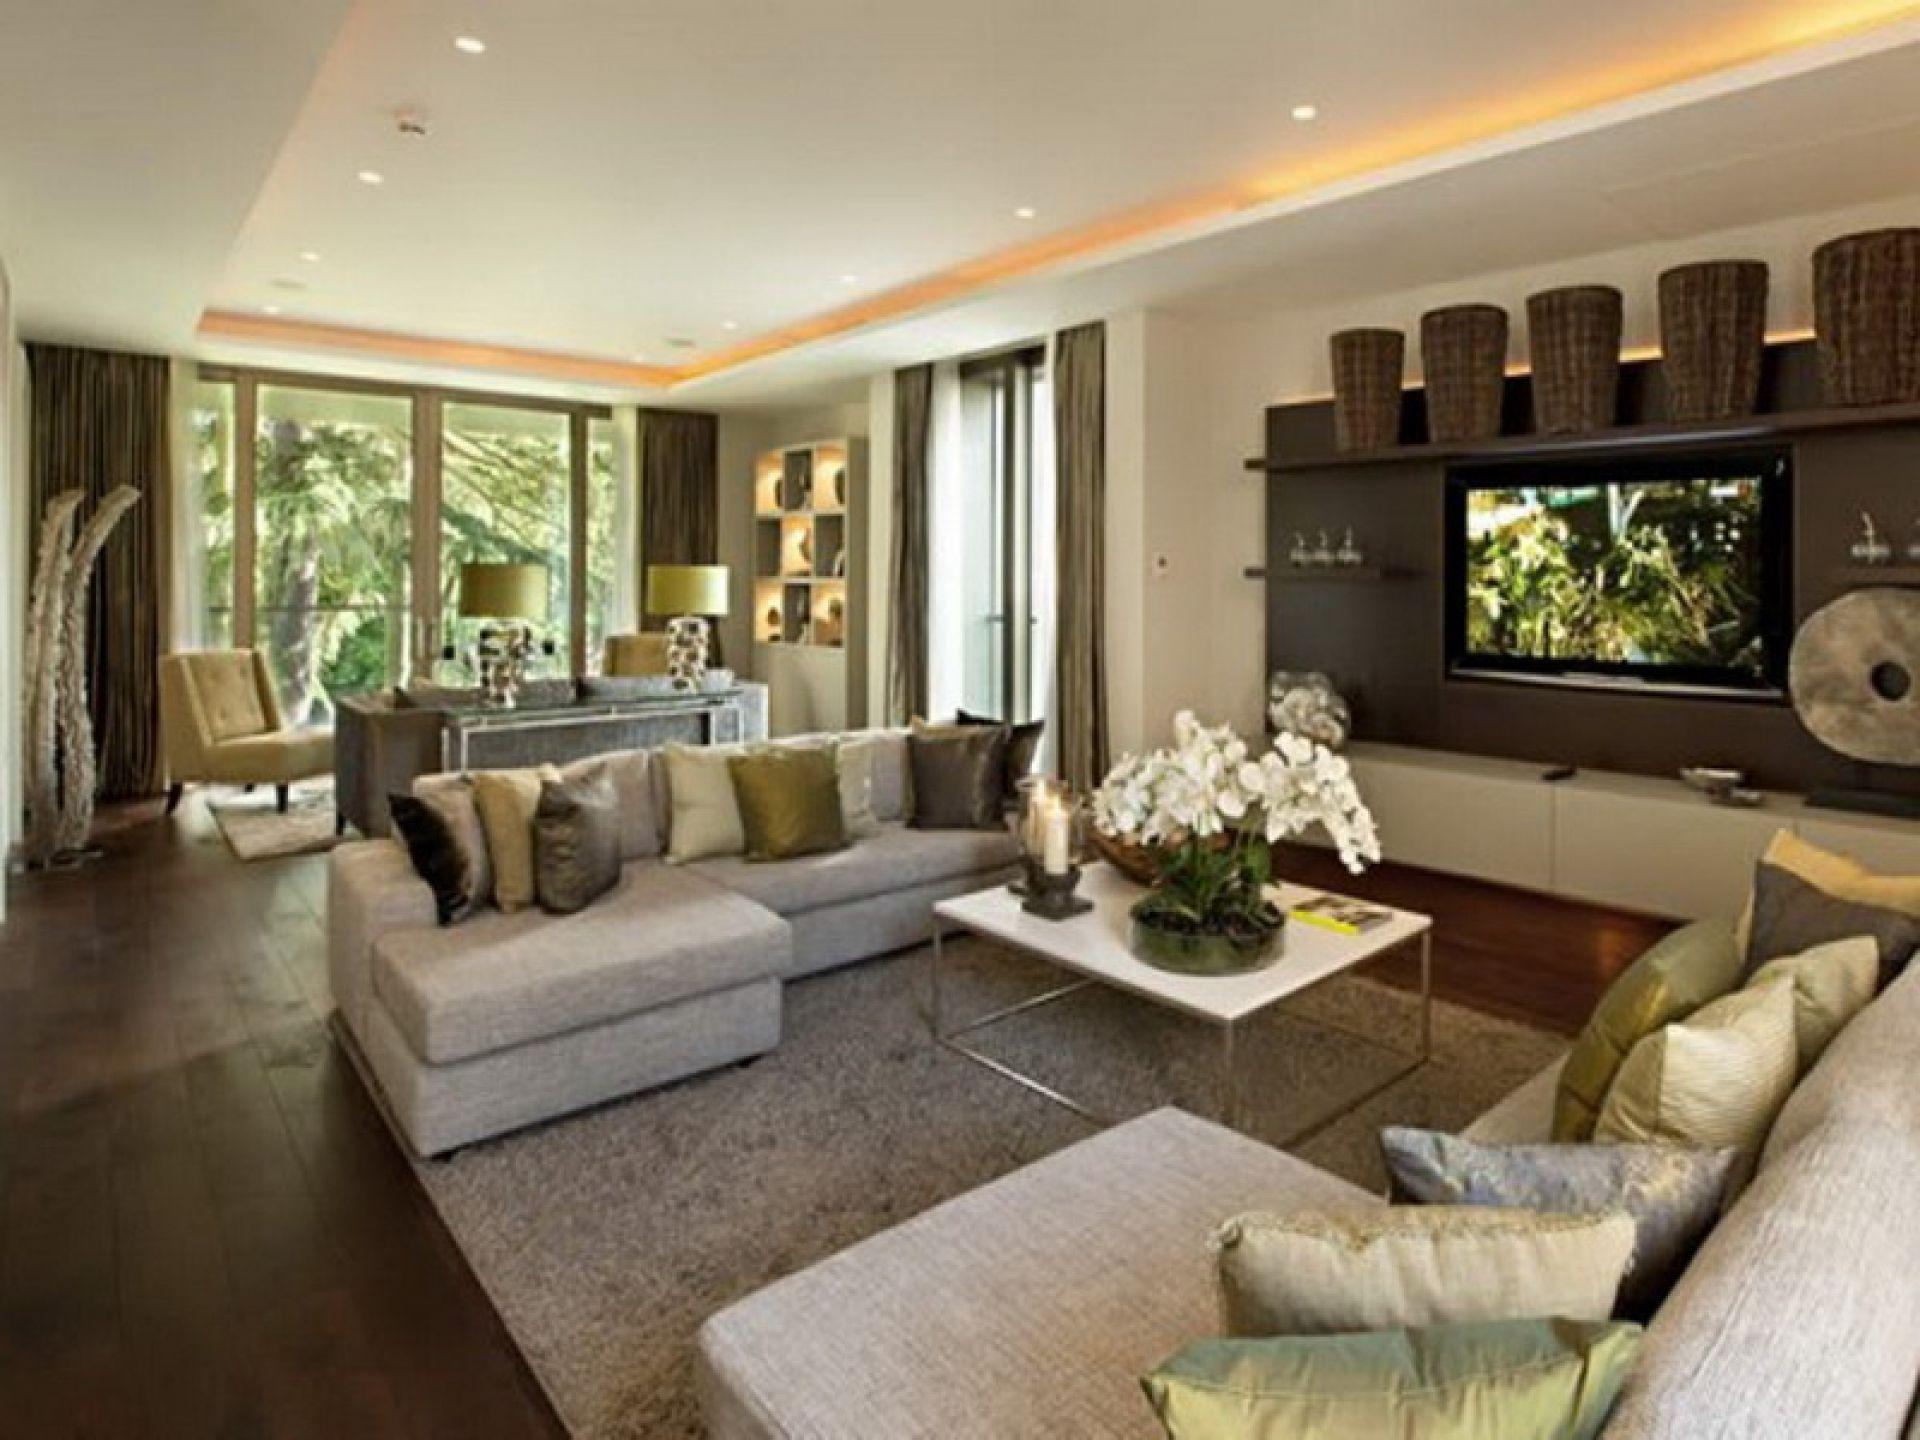 Simple house interior design ideas beautiful simple house decor and interior furniture home decor